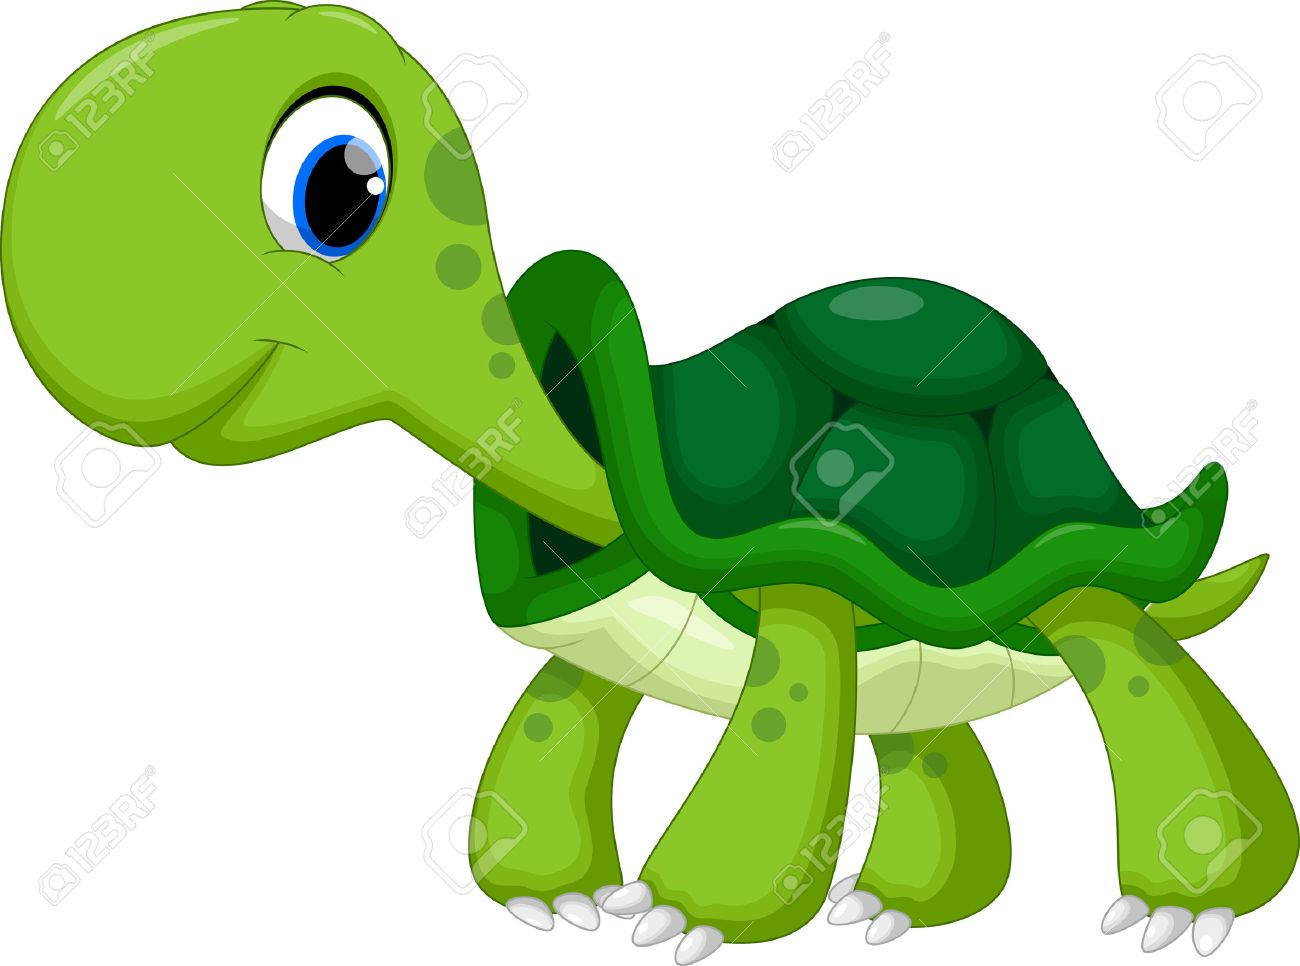 Cute turtle cartoon - 44627976